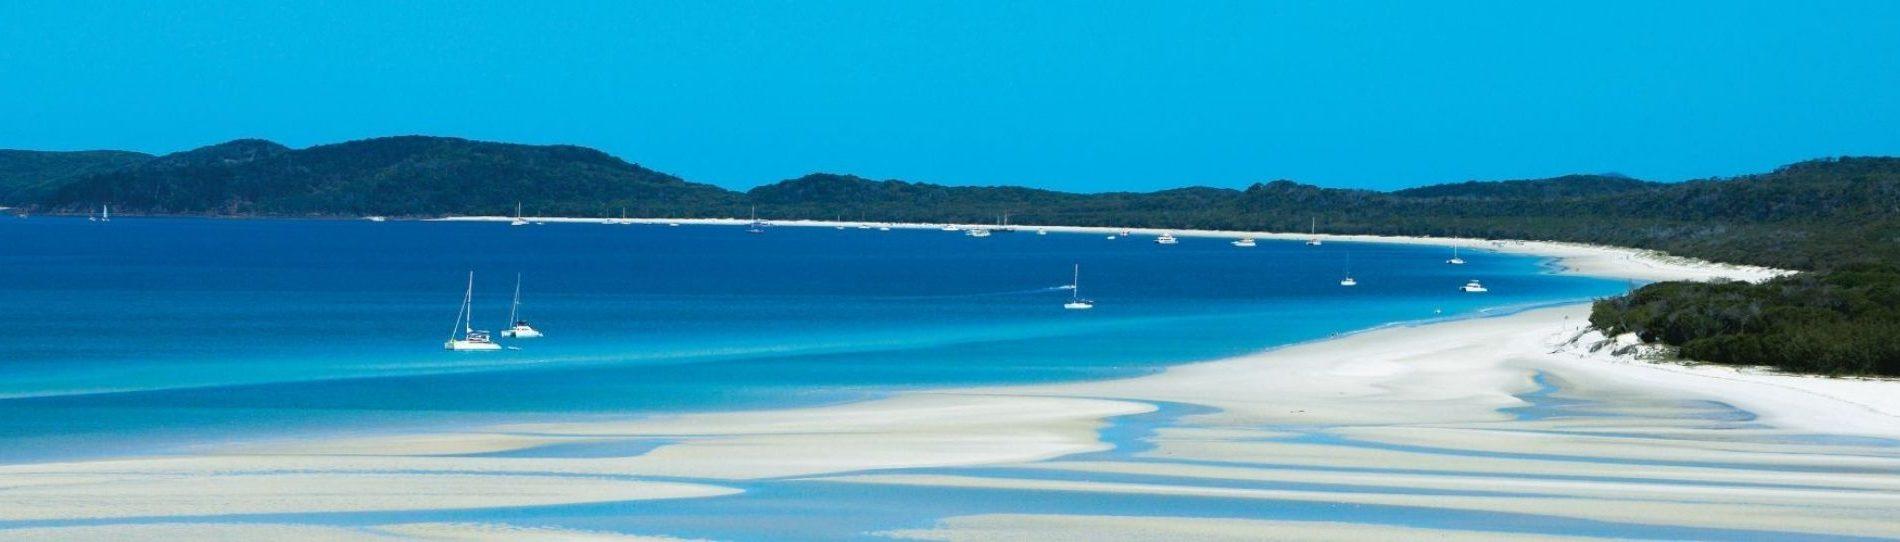 airlie beach team trip destination header